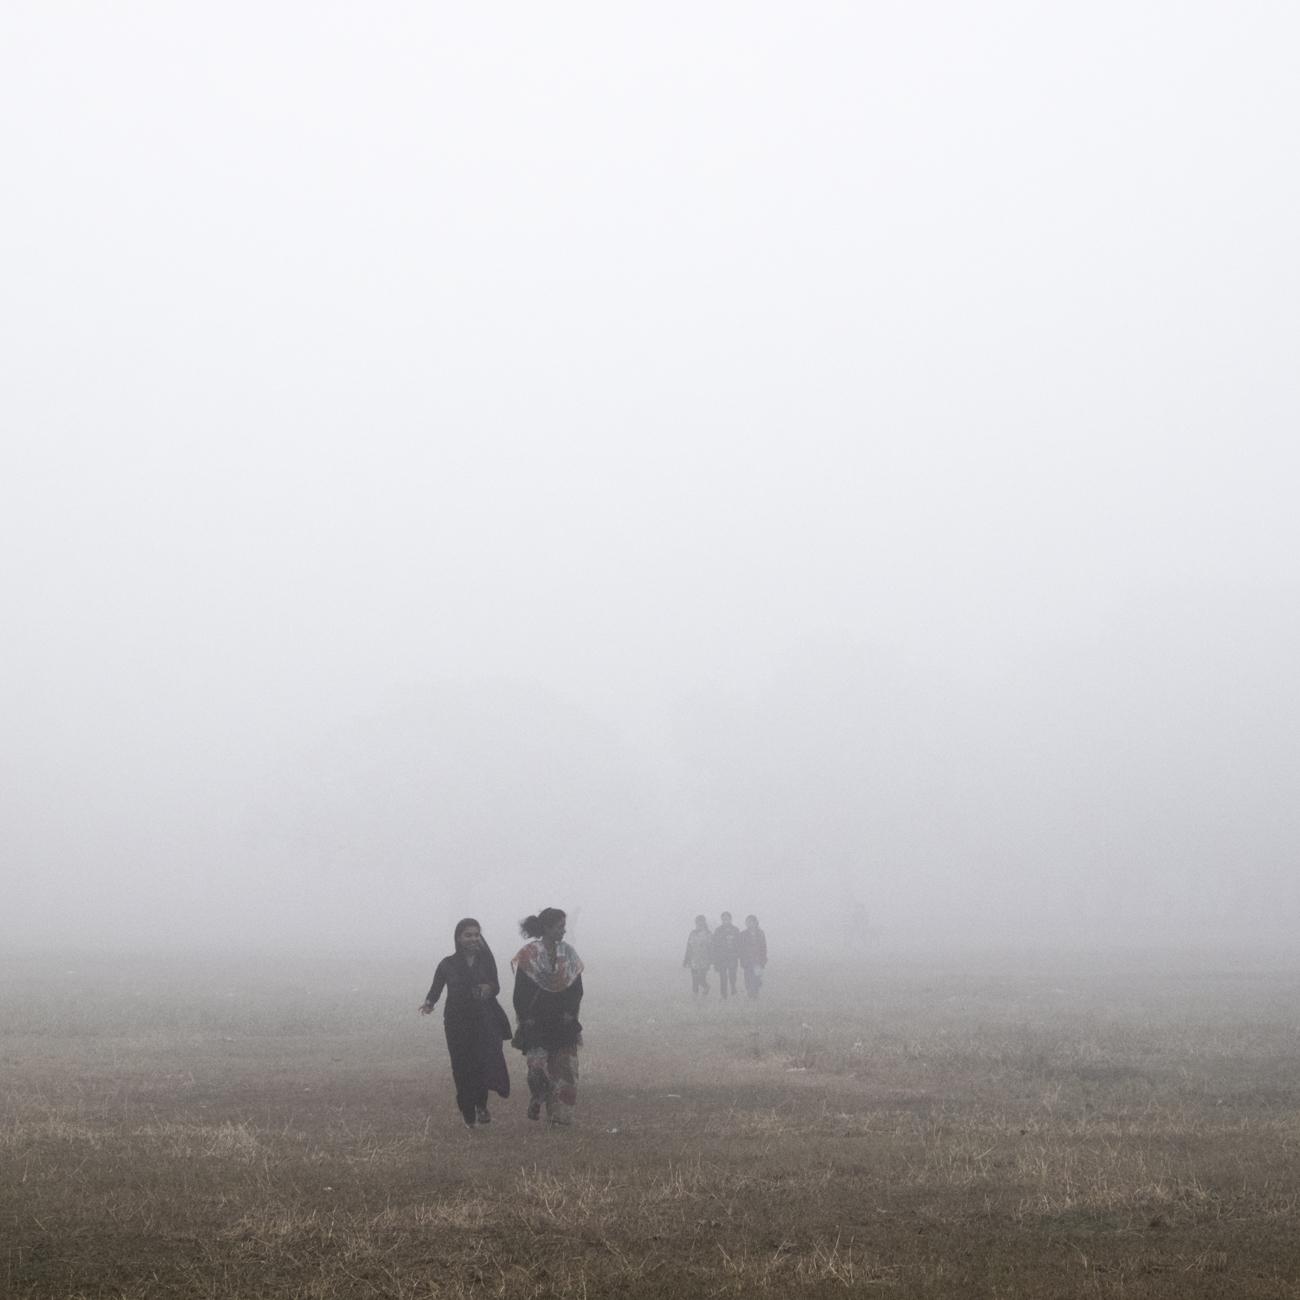 India 2015 - BERNAT GARCÍA, Photography